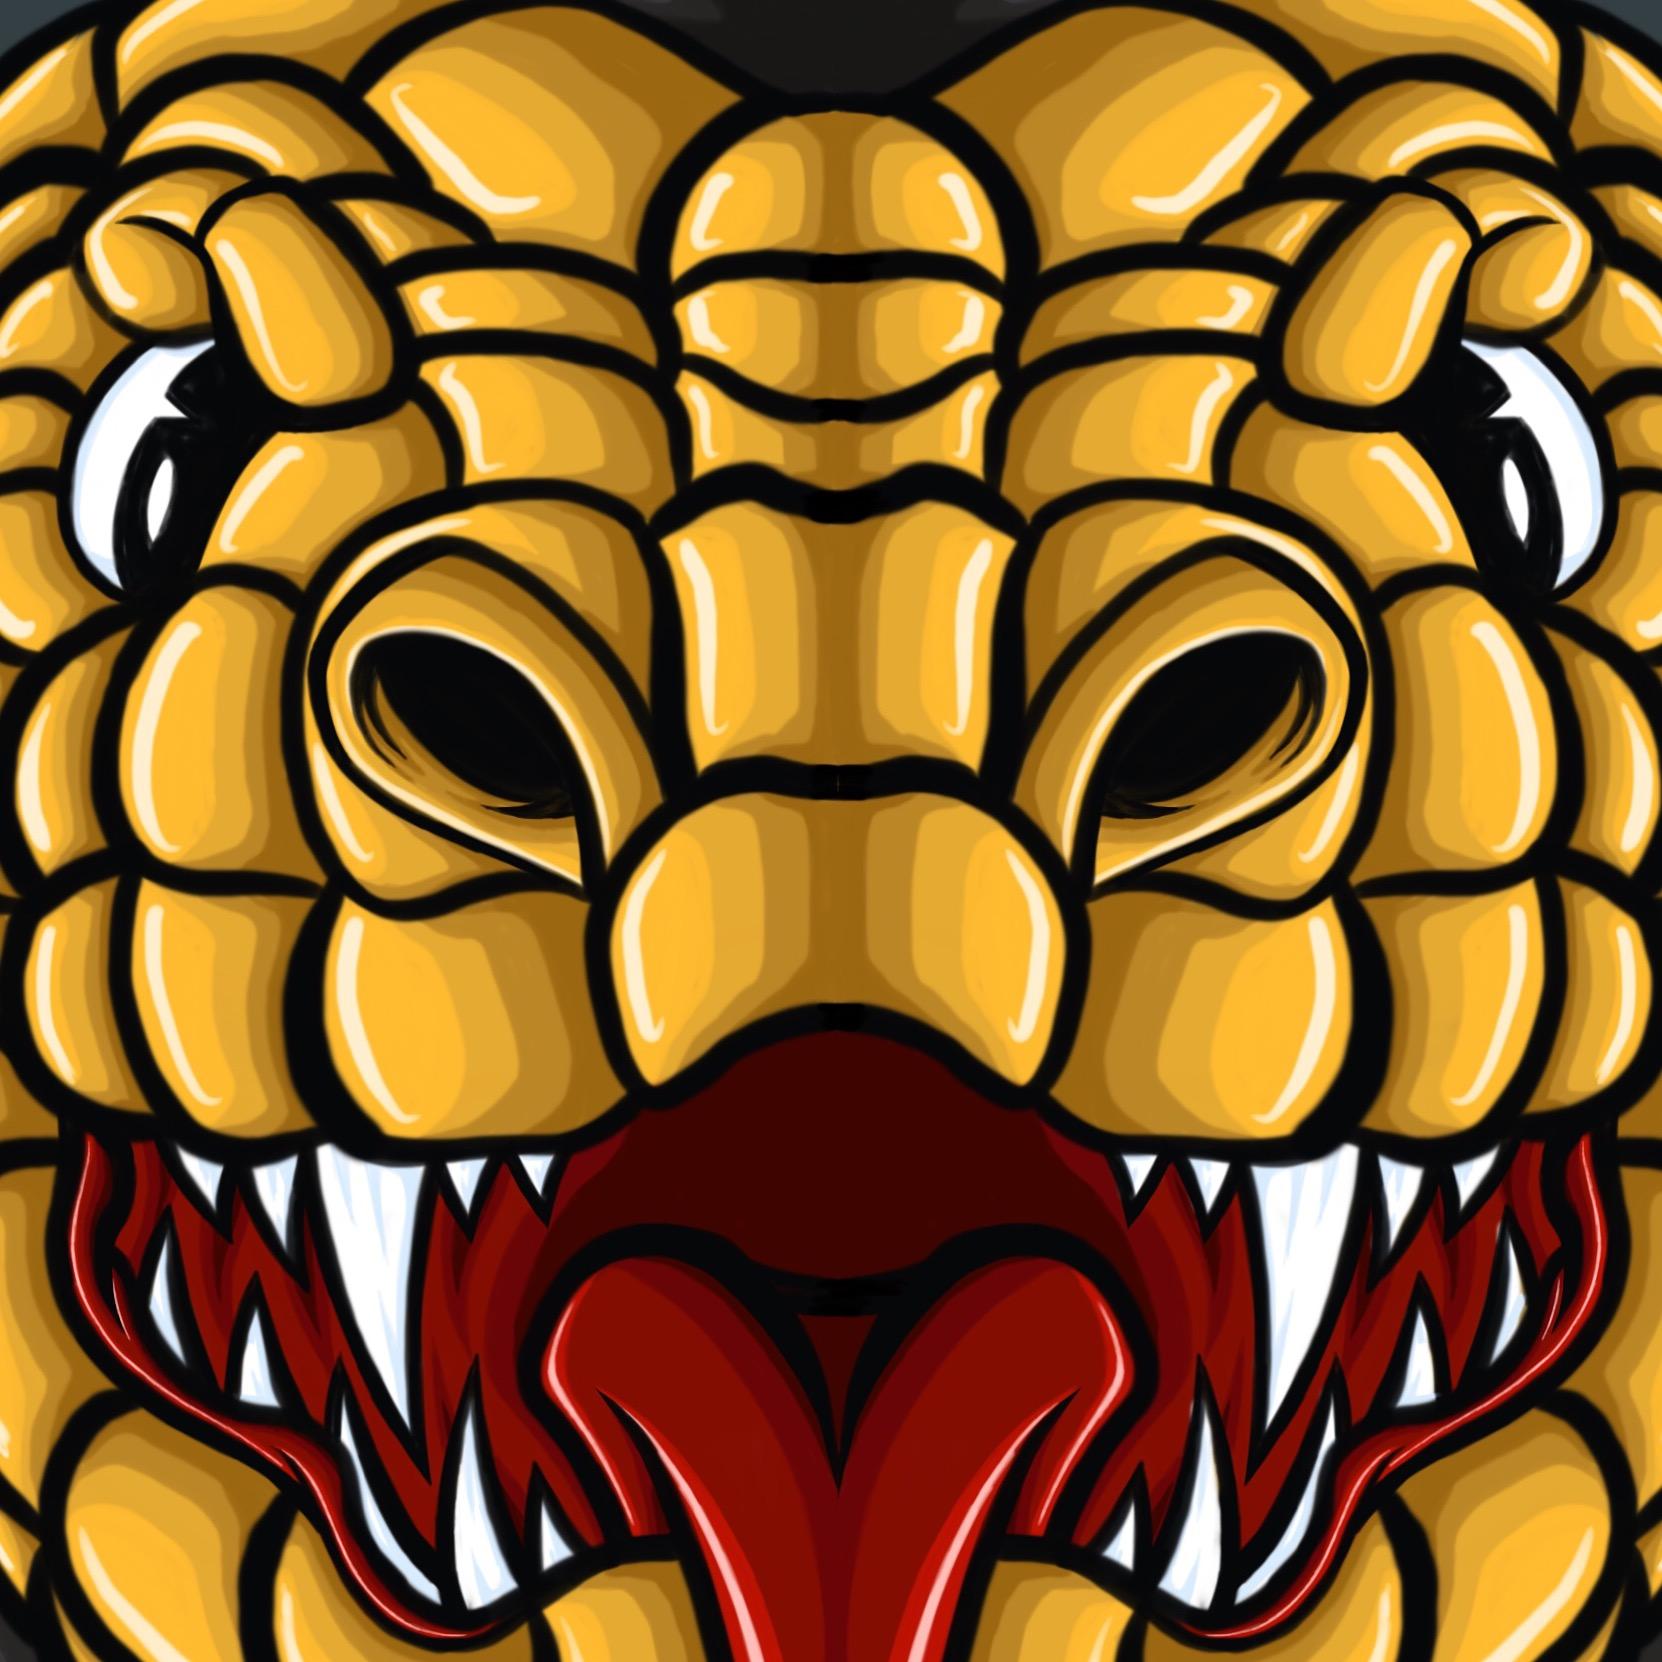 orozcodesign-vegasgoldenknights-chance-mascot-illustration-close.JPG